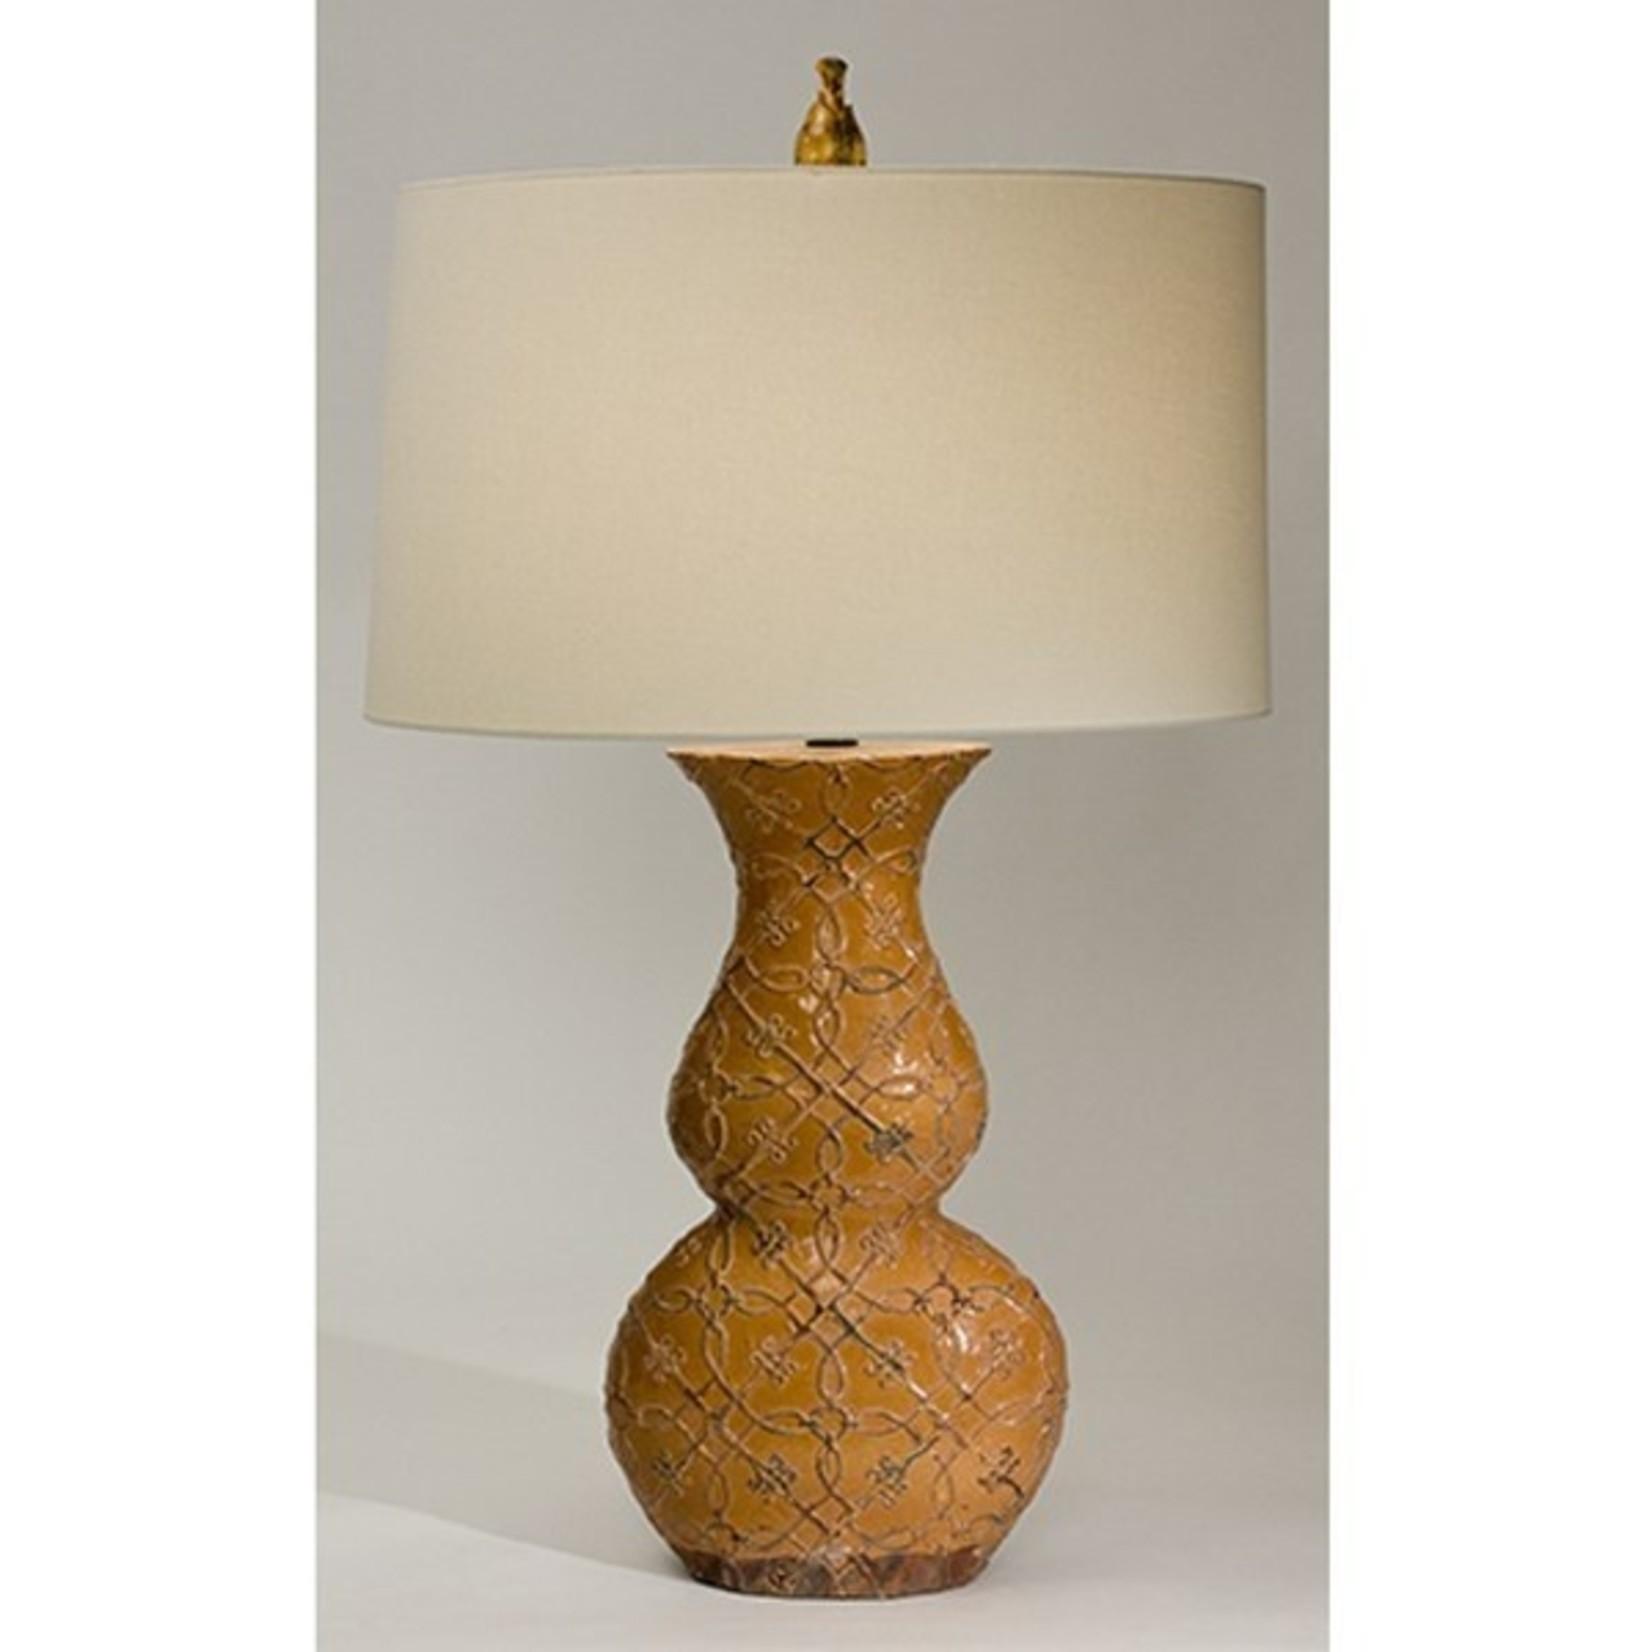 The Natural Light Torta Table Lamp